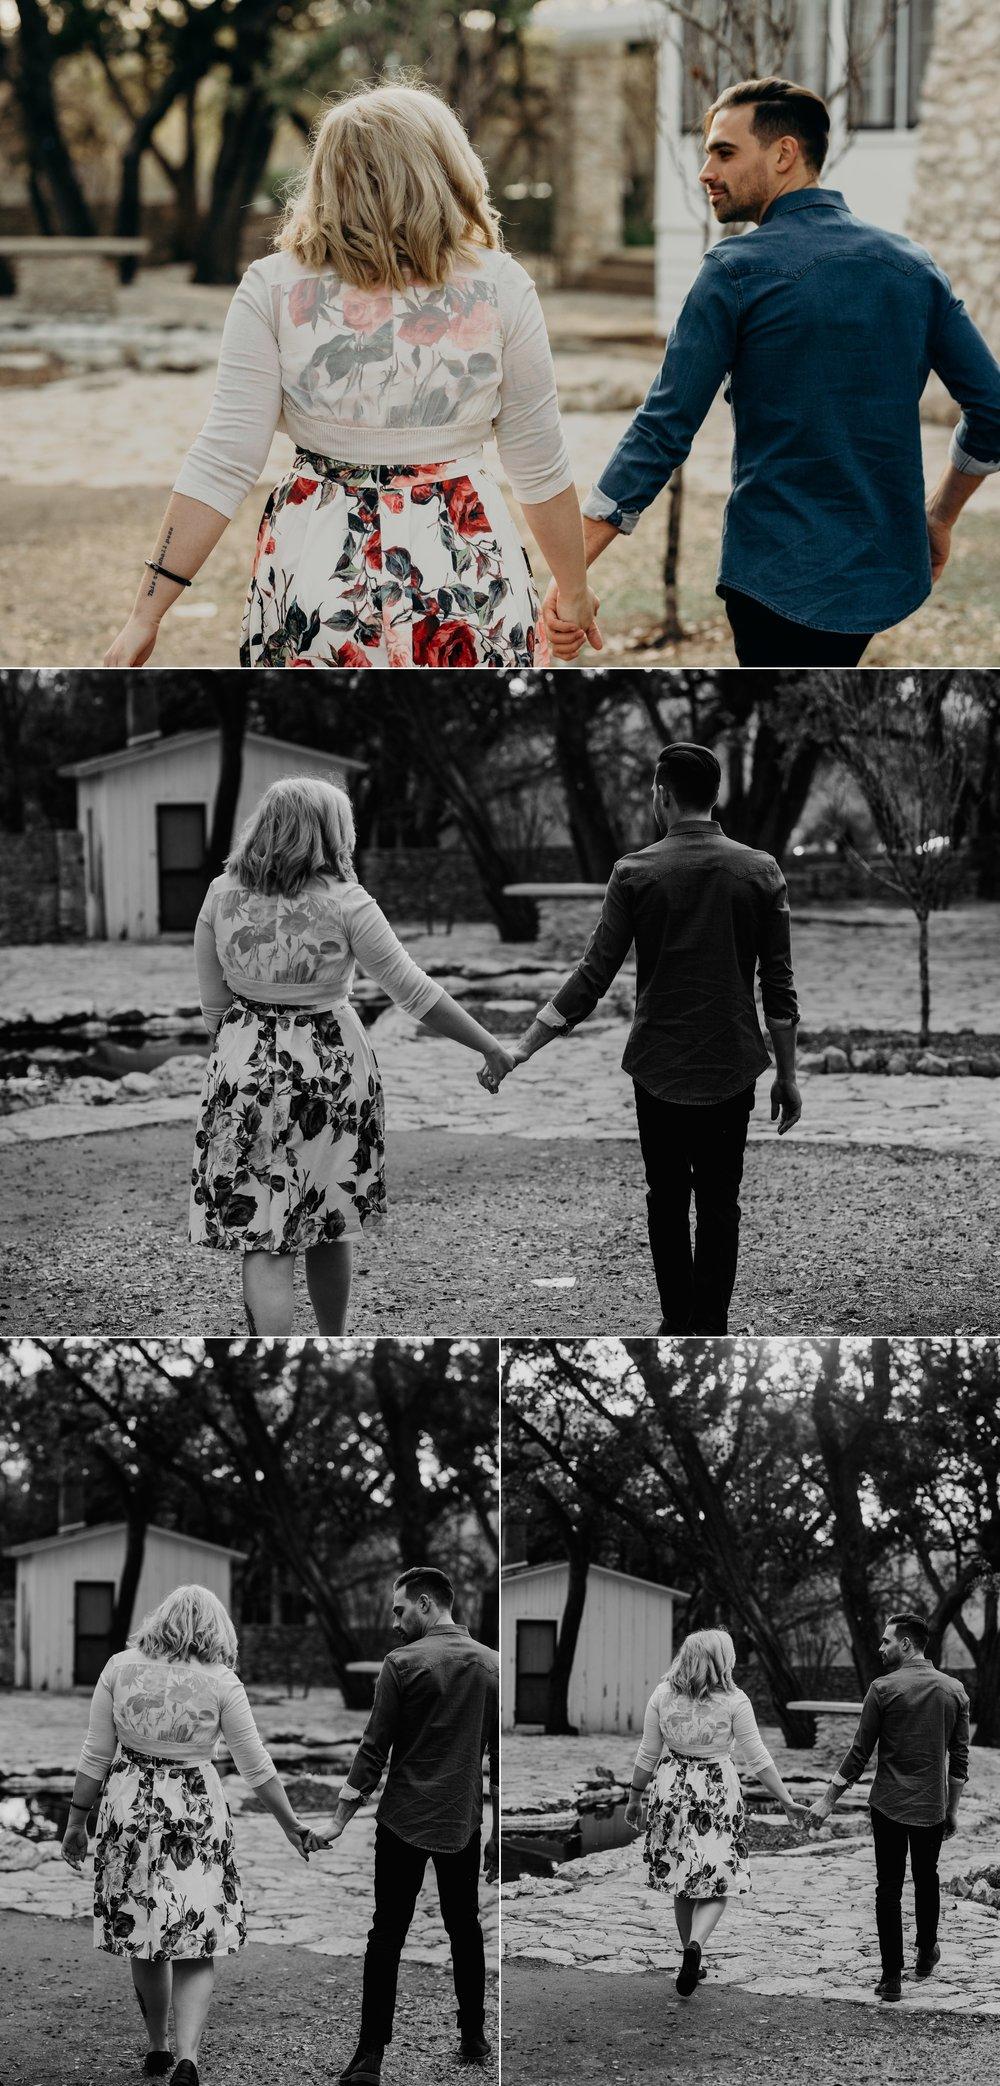 drew-andrew-texas-austin-minnesota-minneapolis-wedding-photographer-destination-elopement-intimate-adventurous_0084.jpg